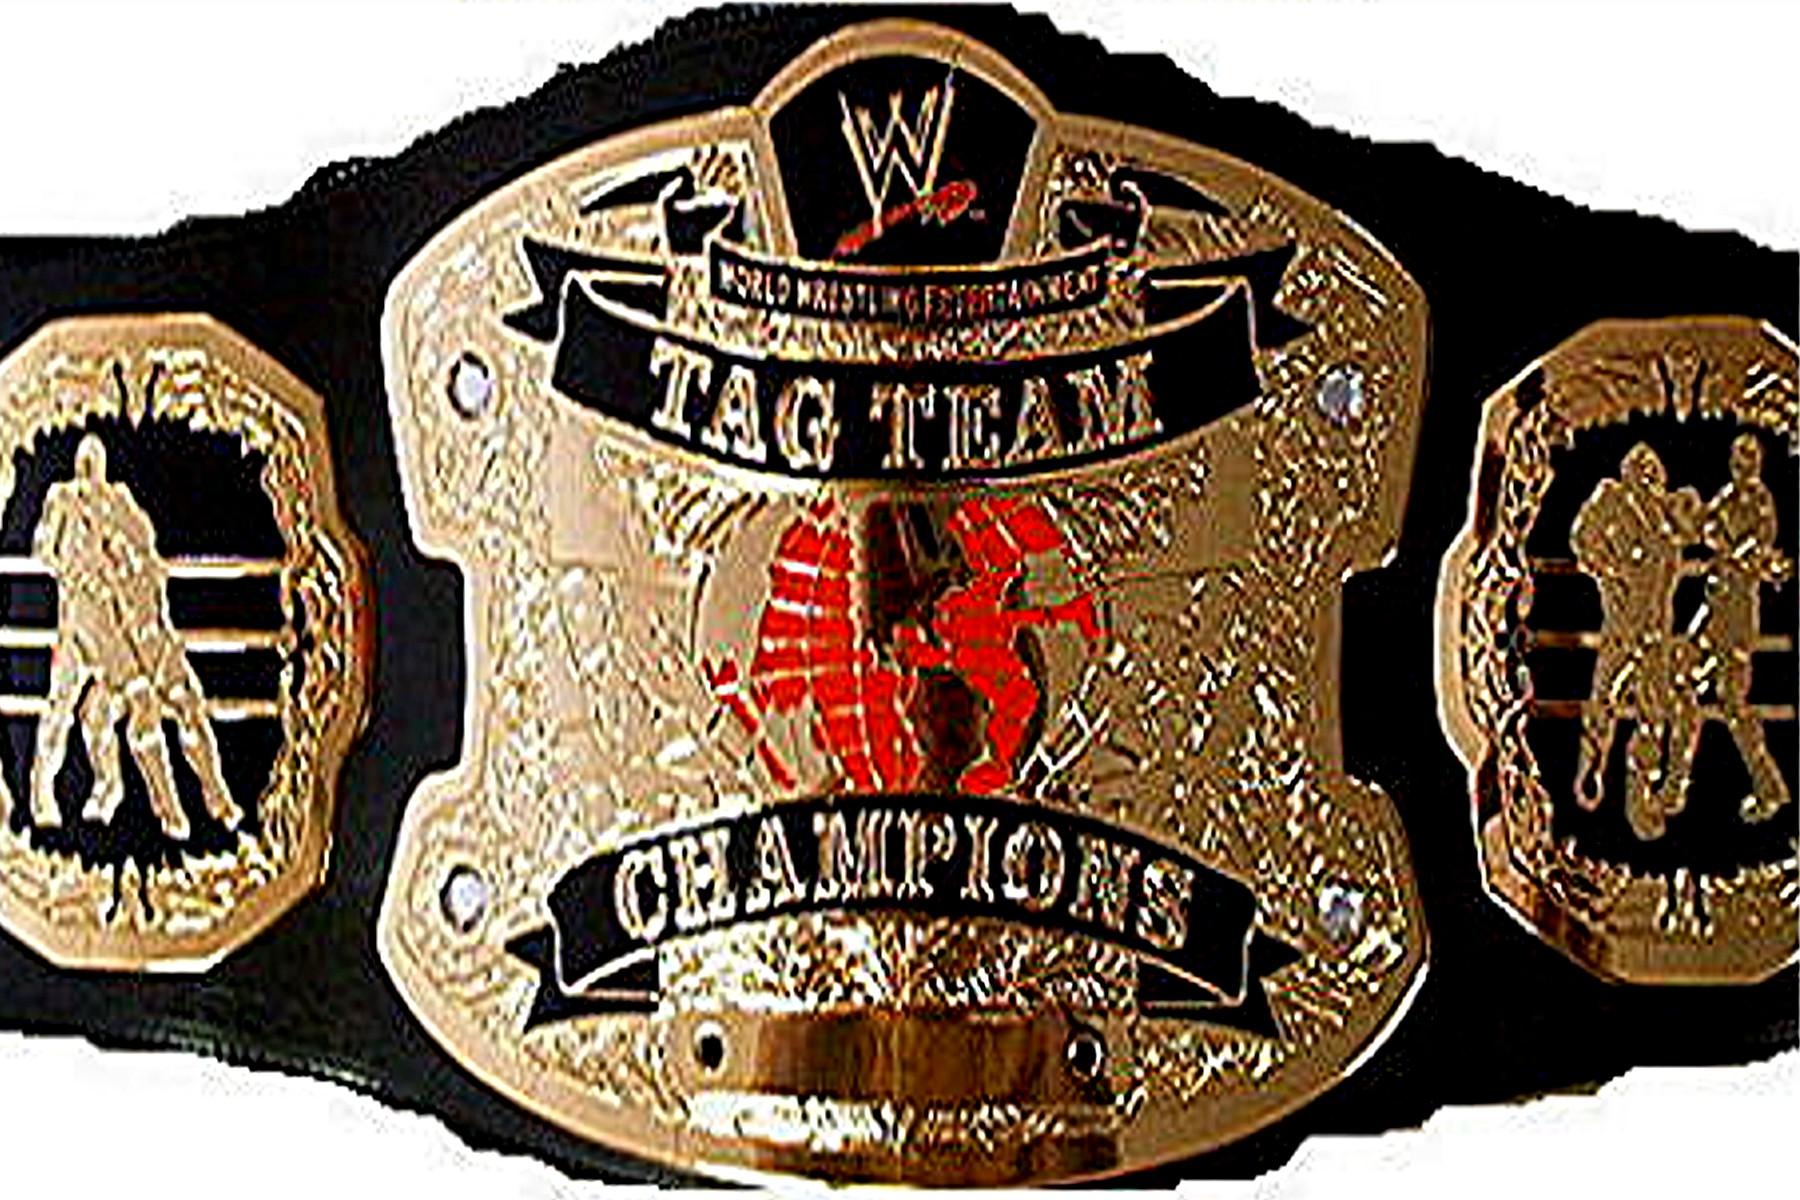 Image - WWE RAW Tag Team Champion.jpg - 487.4KB